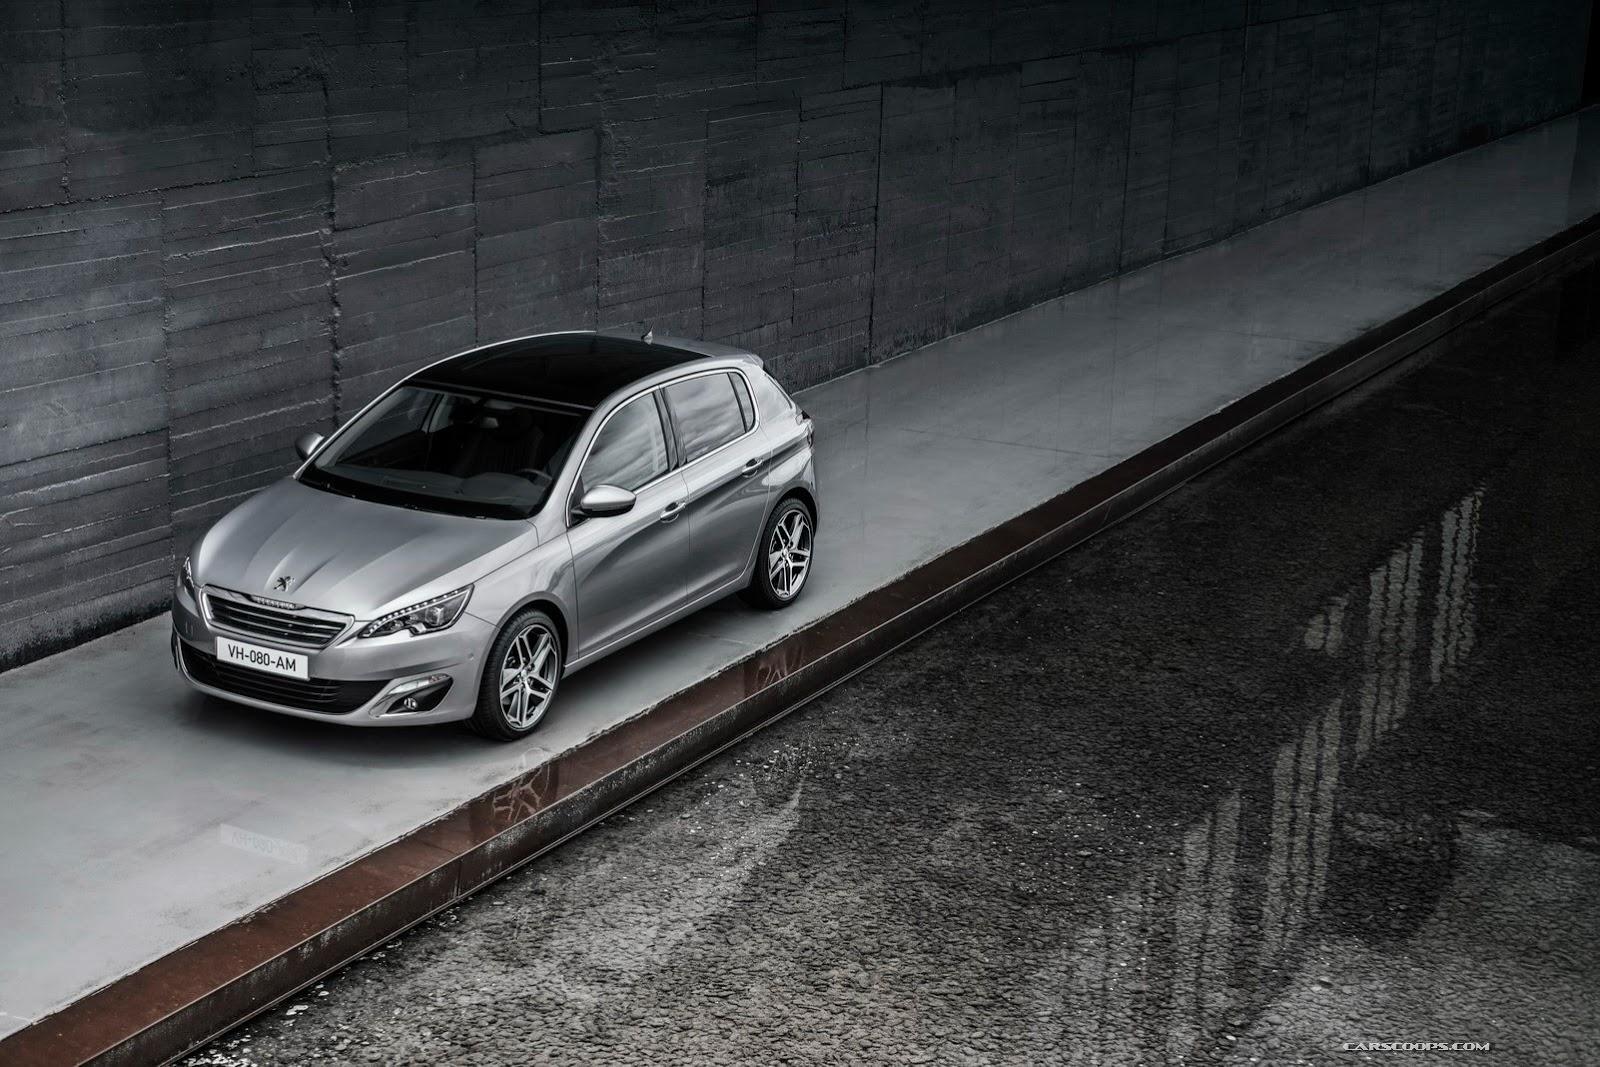 2014-Peugeot-308-Hatch-Carscoops-74%25255B2%25255D.jpg